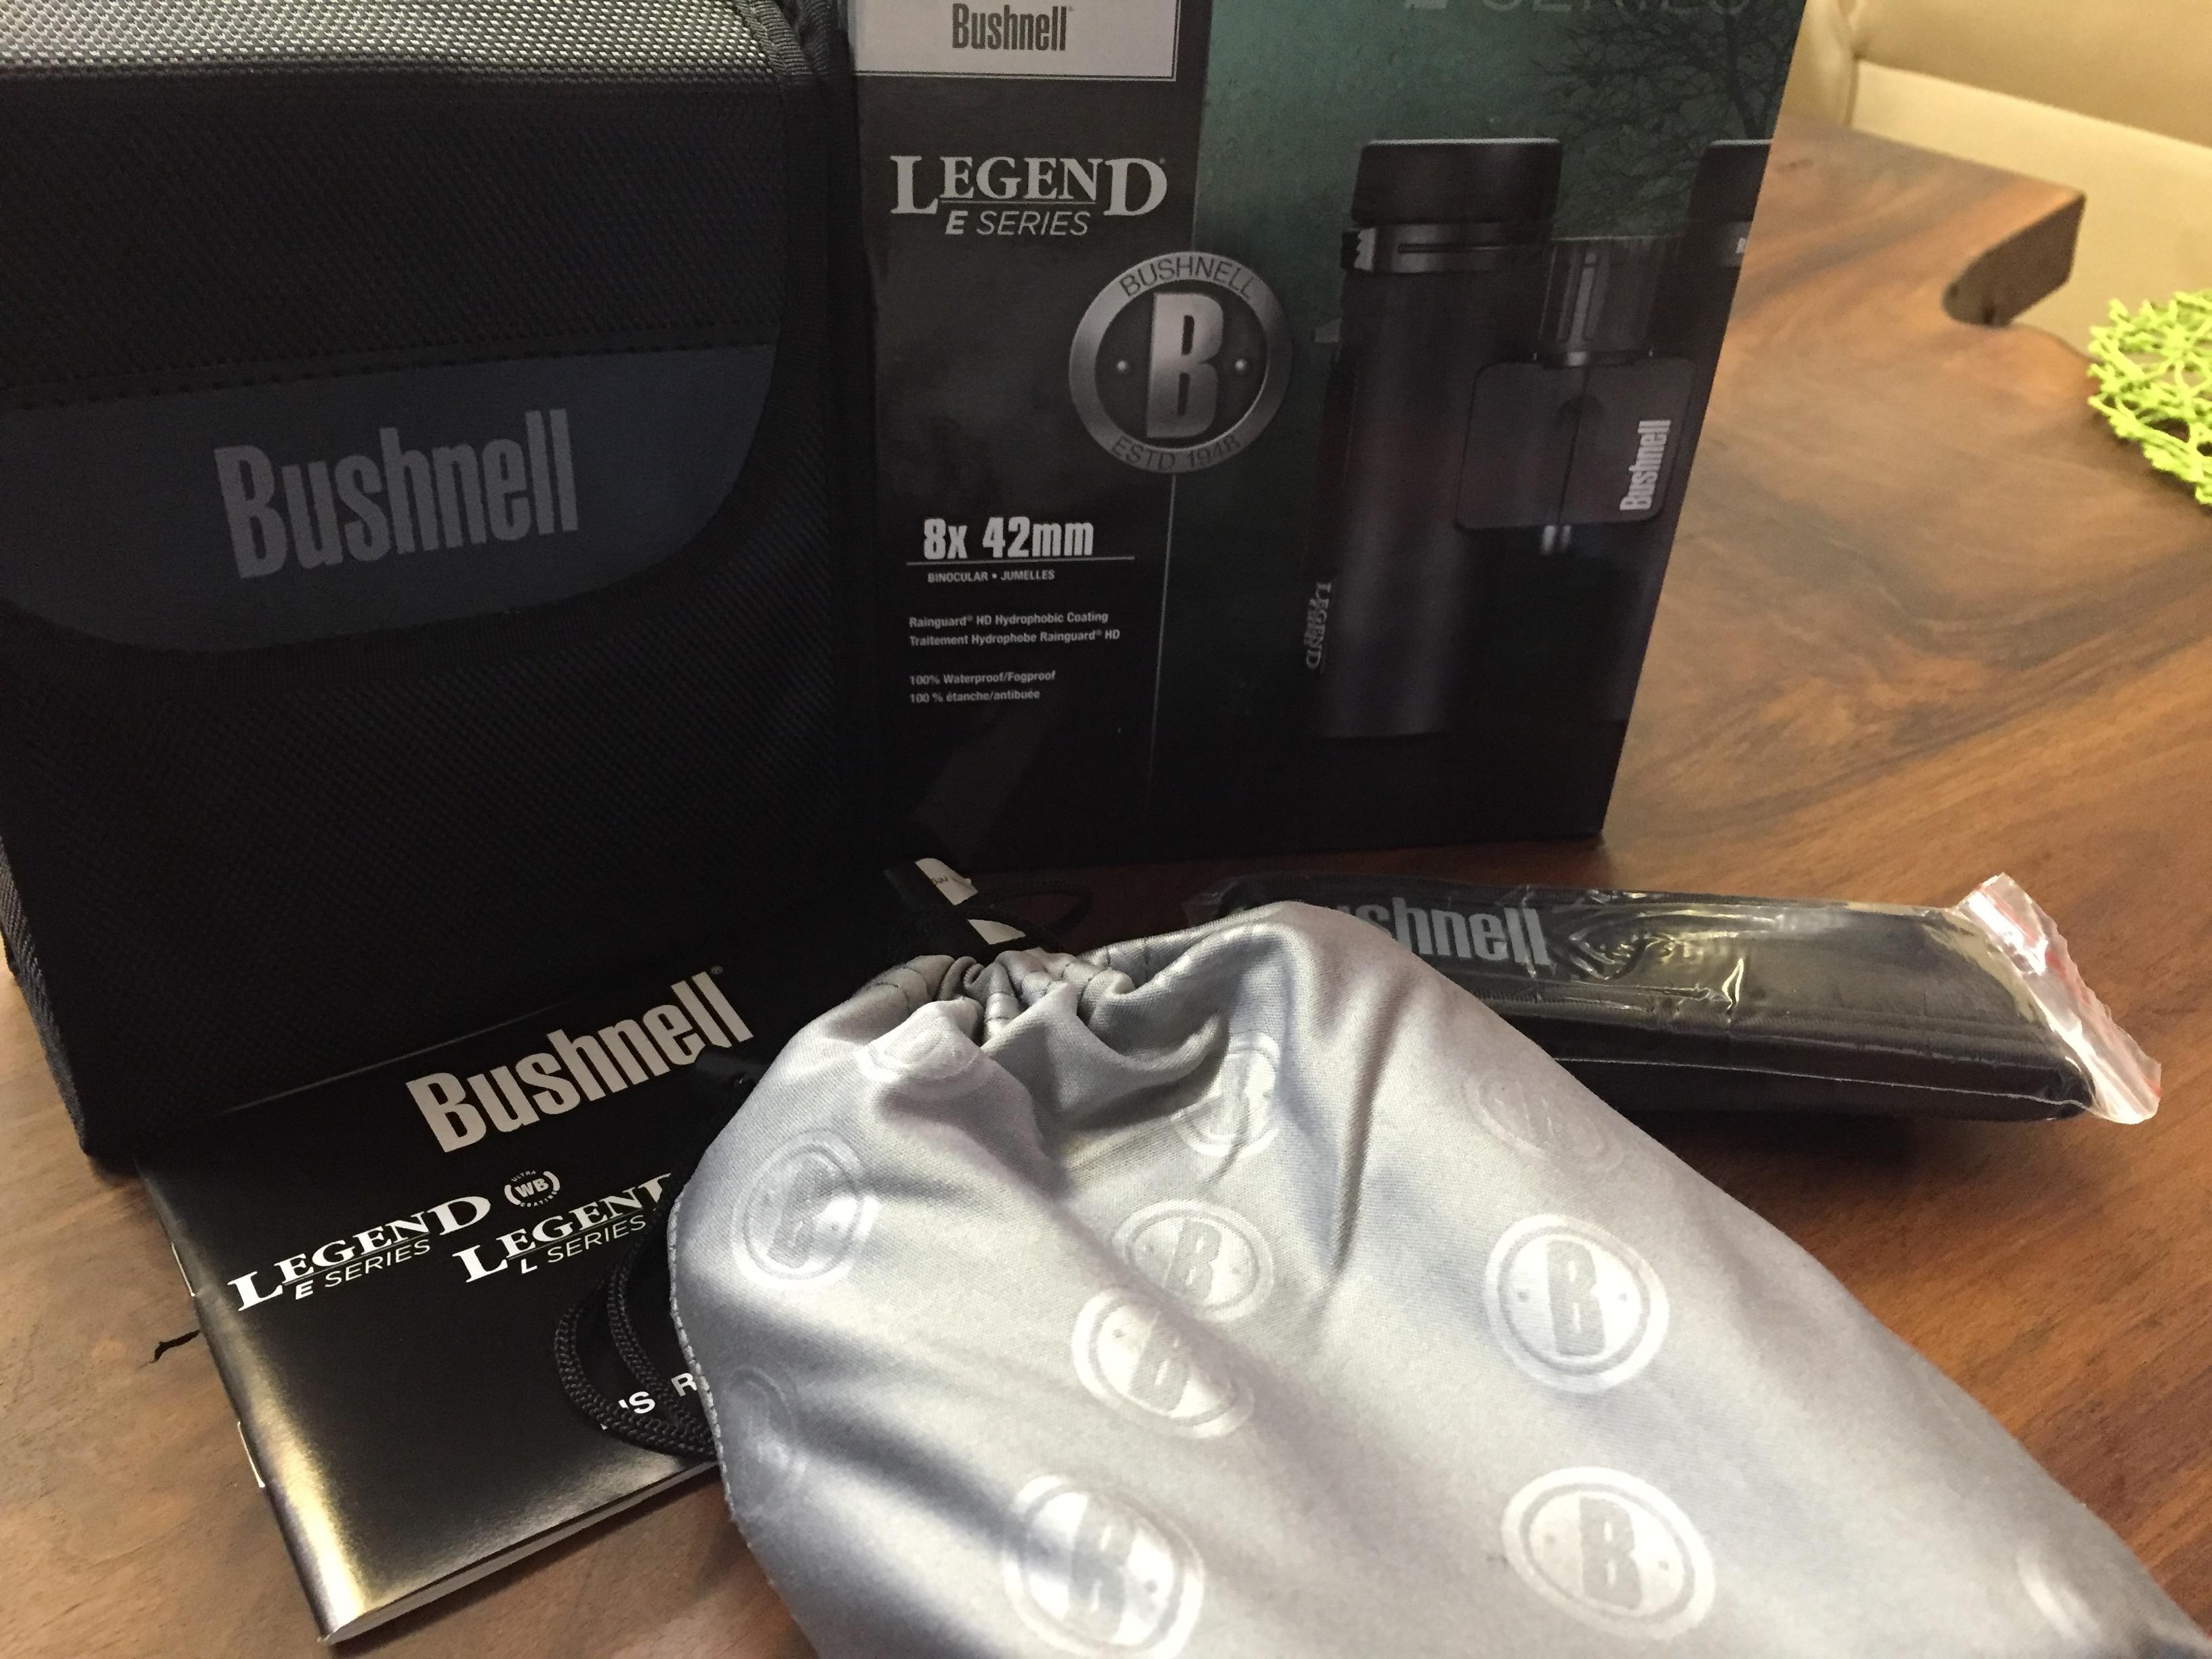 Bushnell Fernglas Mit Entfernungsmesser Test : Test bushnell mm legend e fernglas u jagd und natur